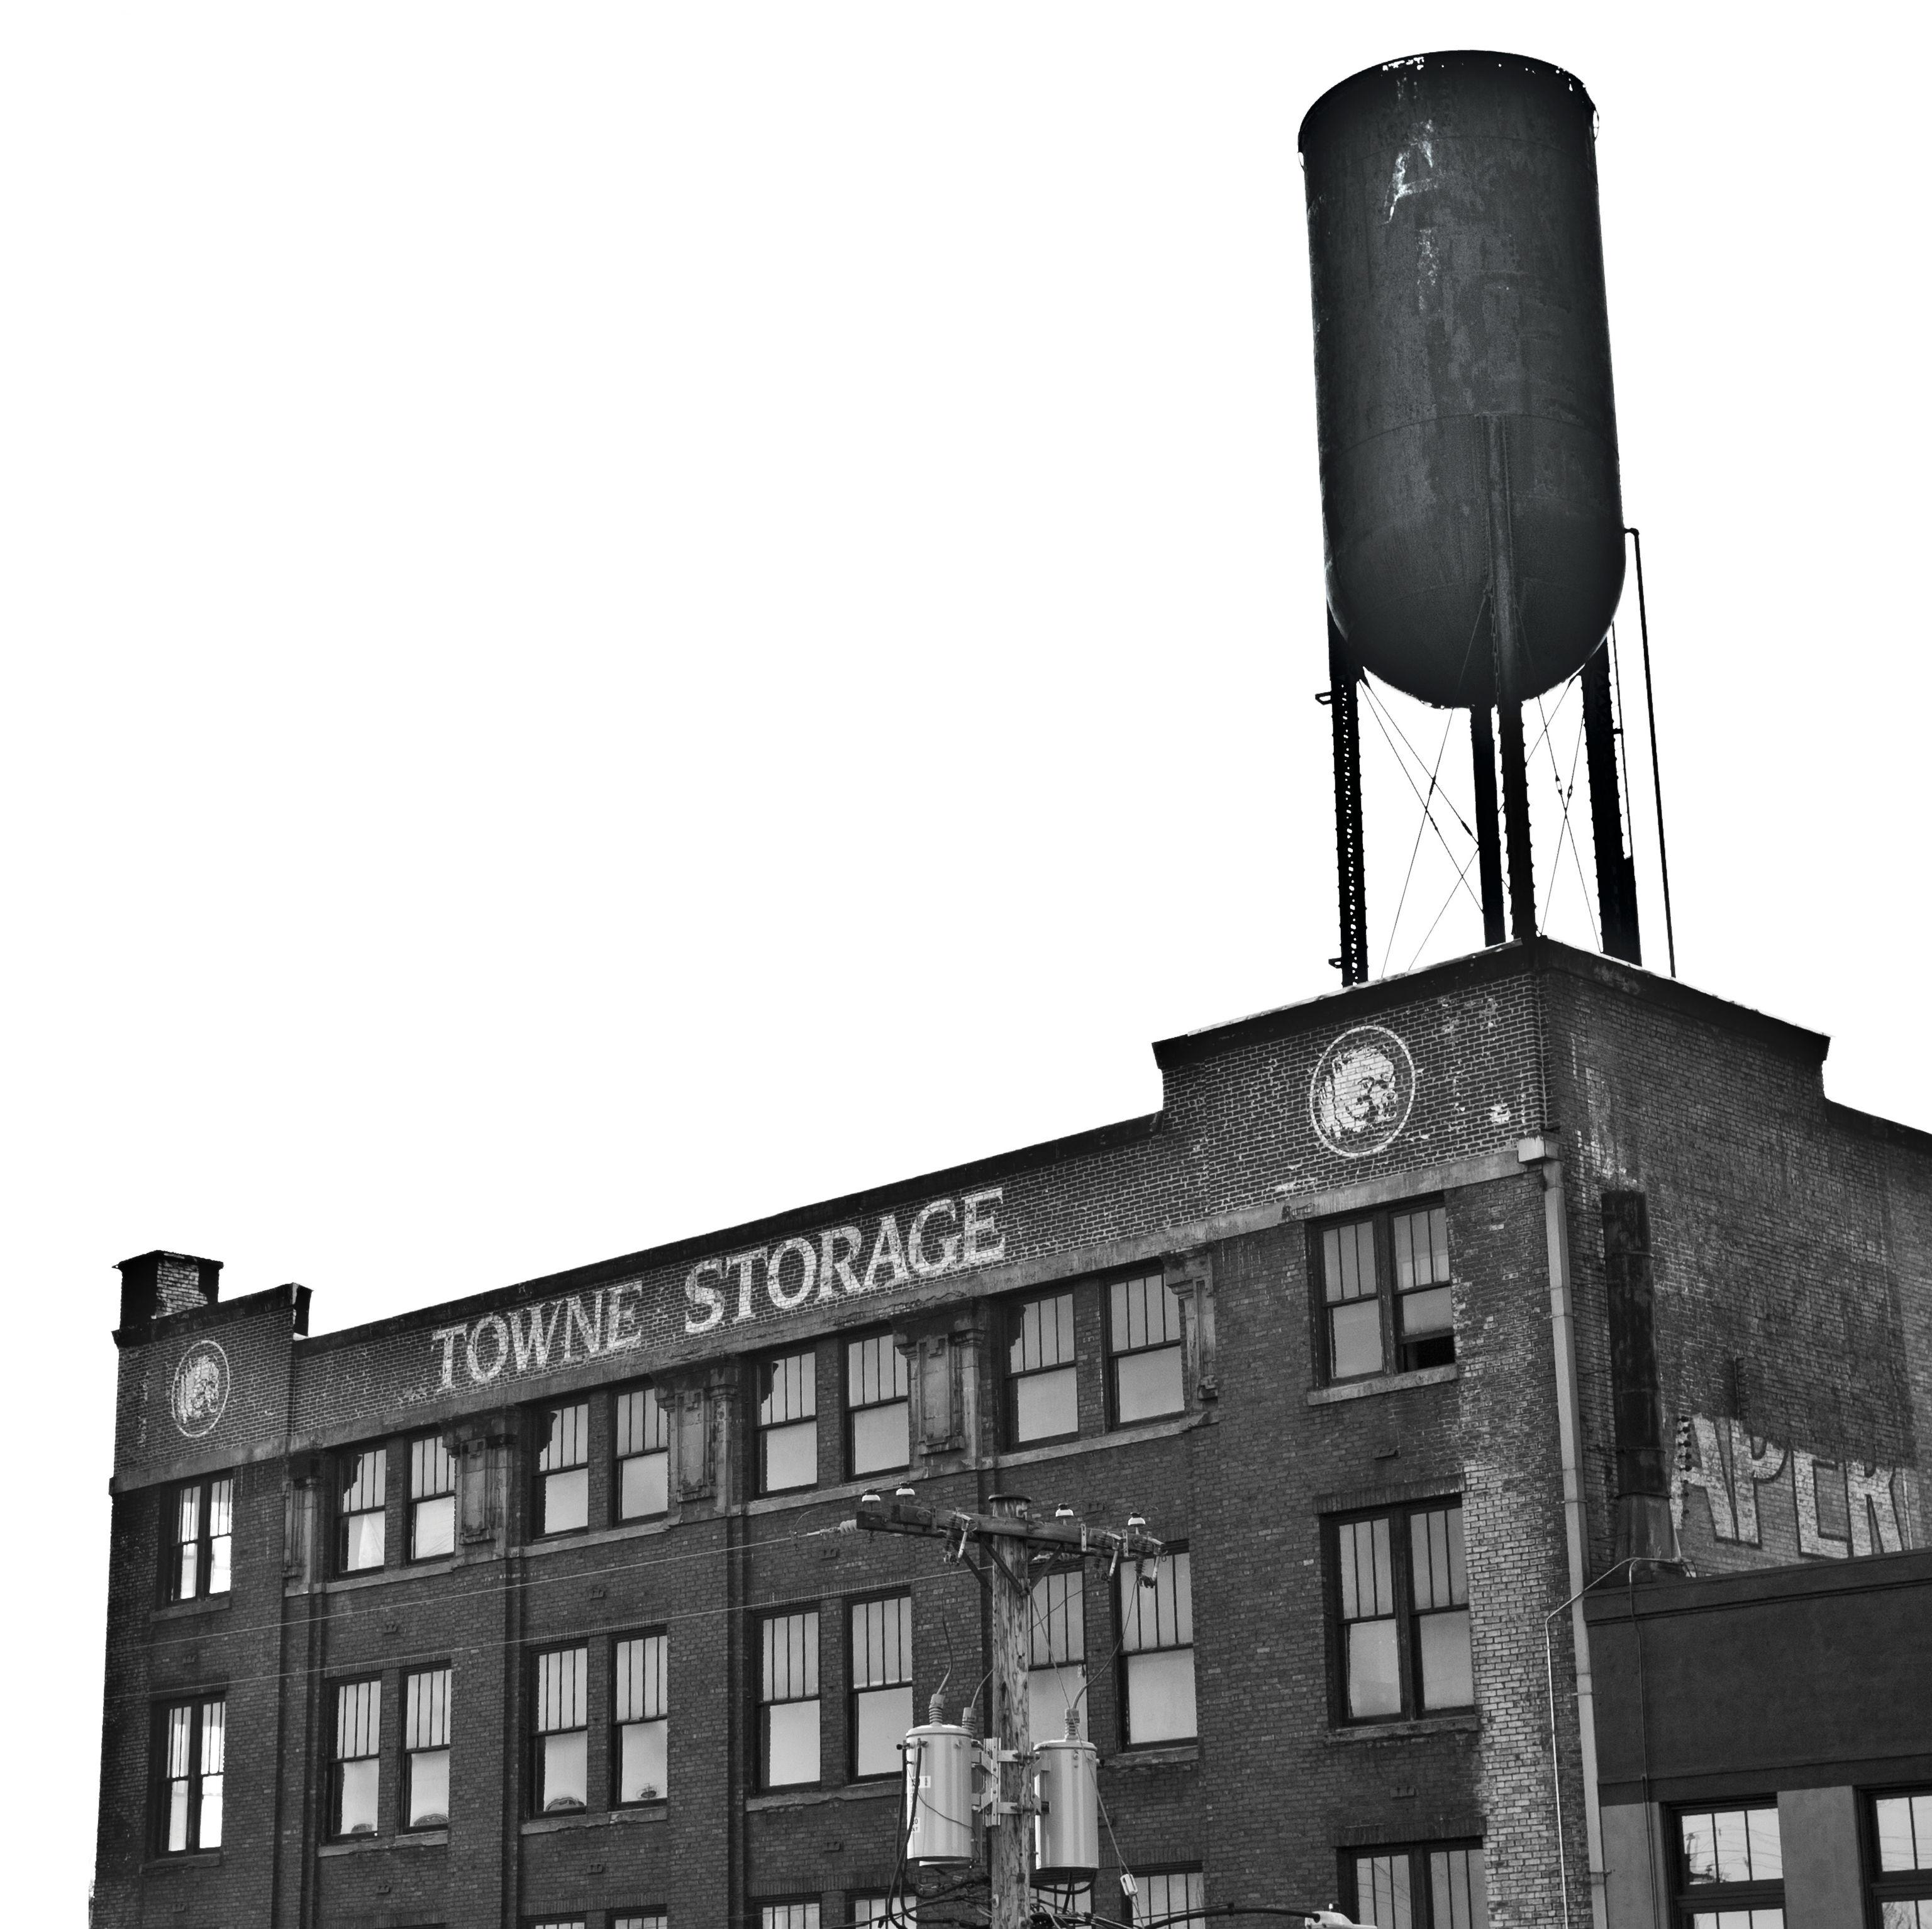 0316 town storage 00 eqiyyl